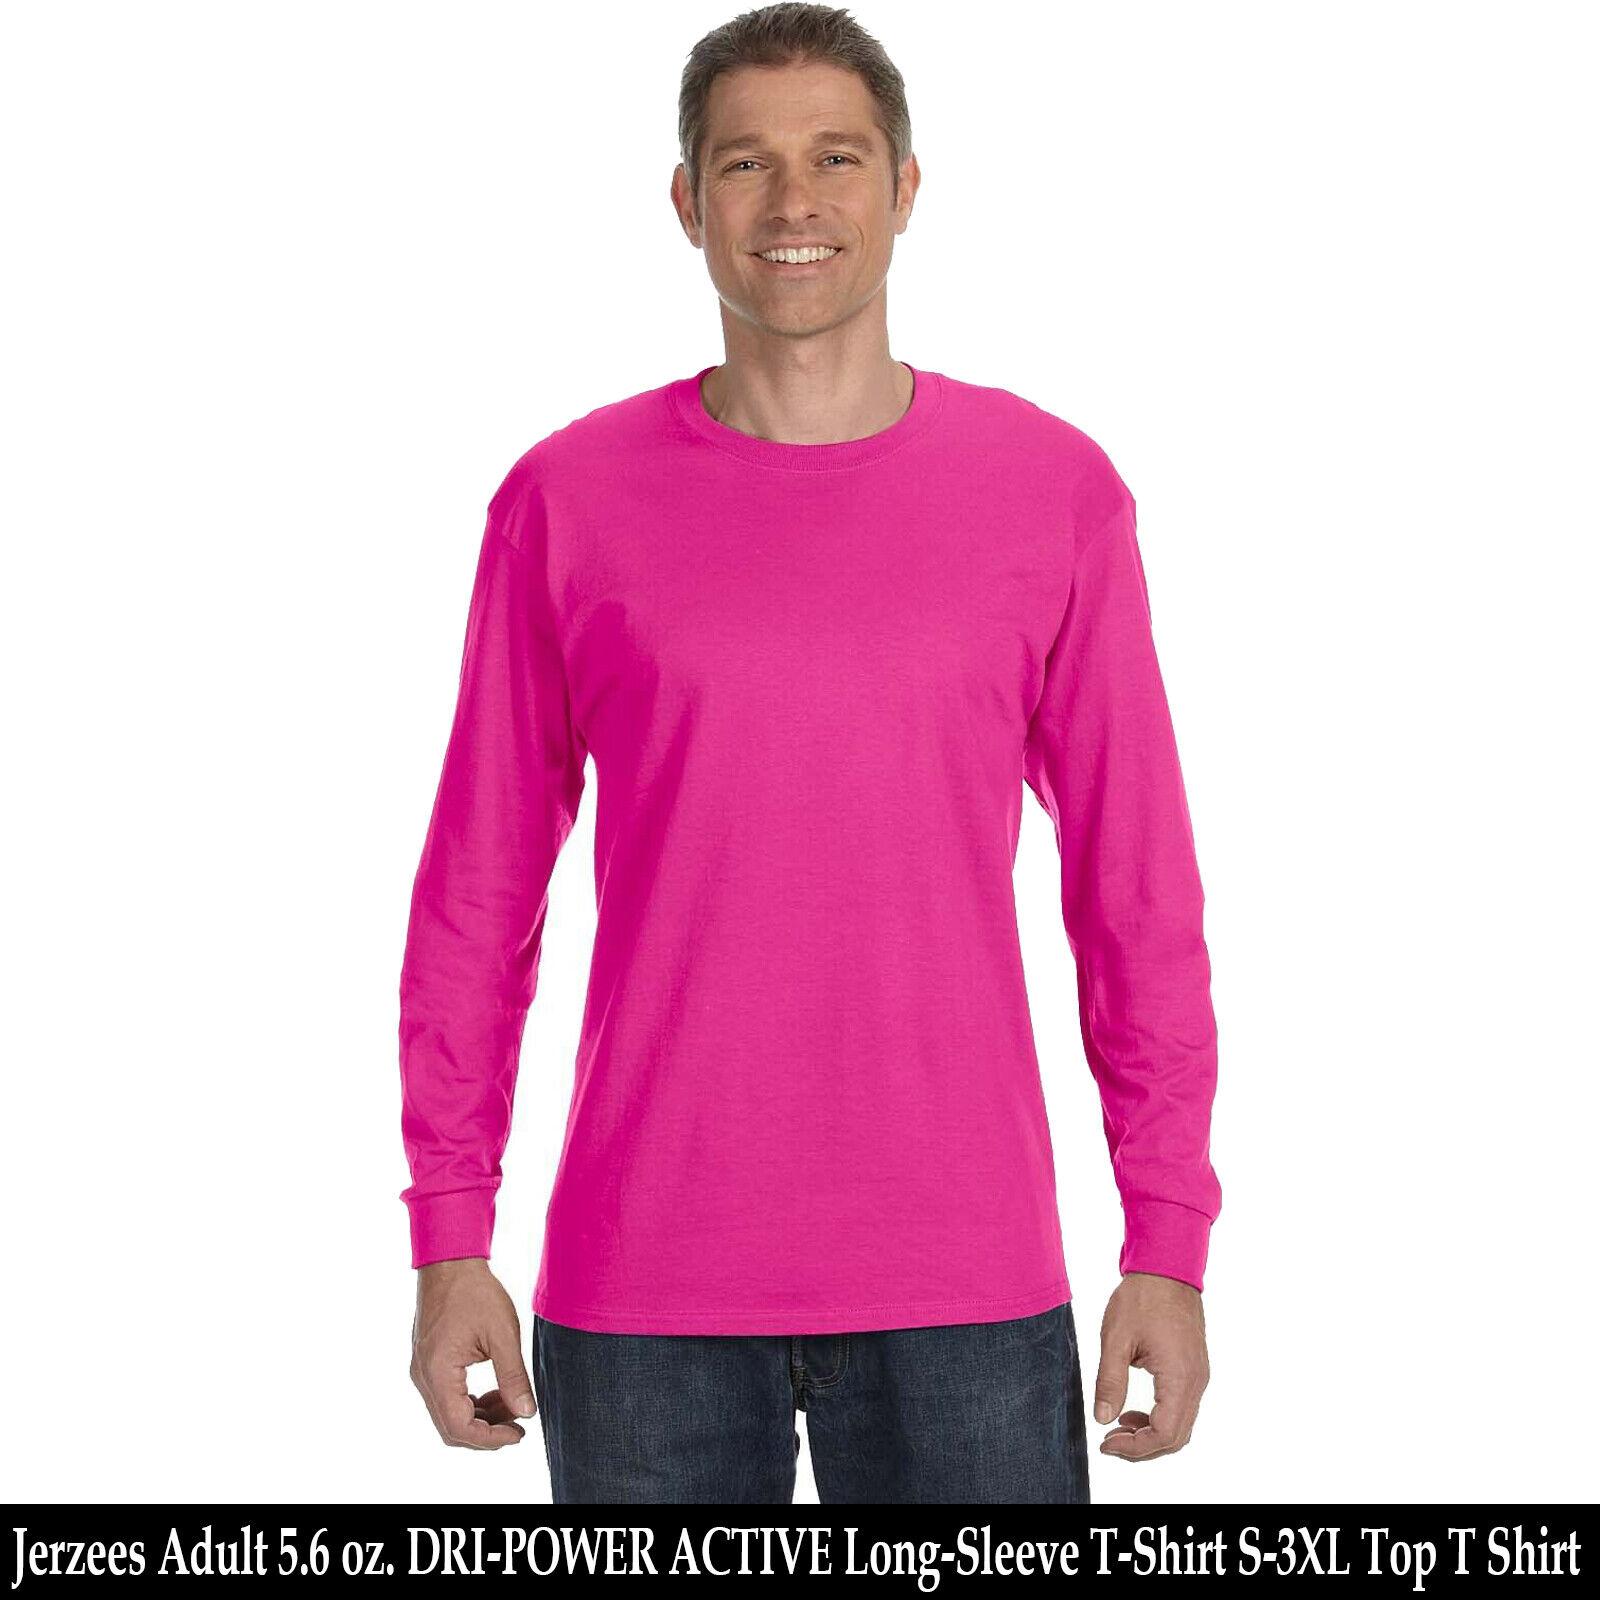 KELLY Jerzees Heavyweight Blend Crewneck Long-Sleeve T-Shirt